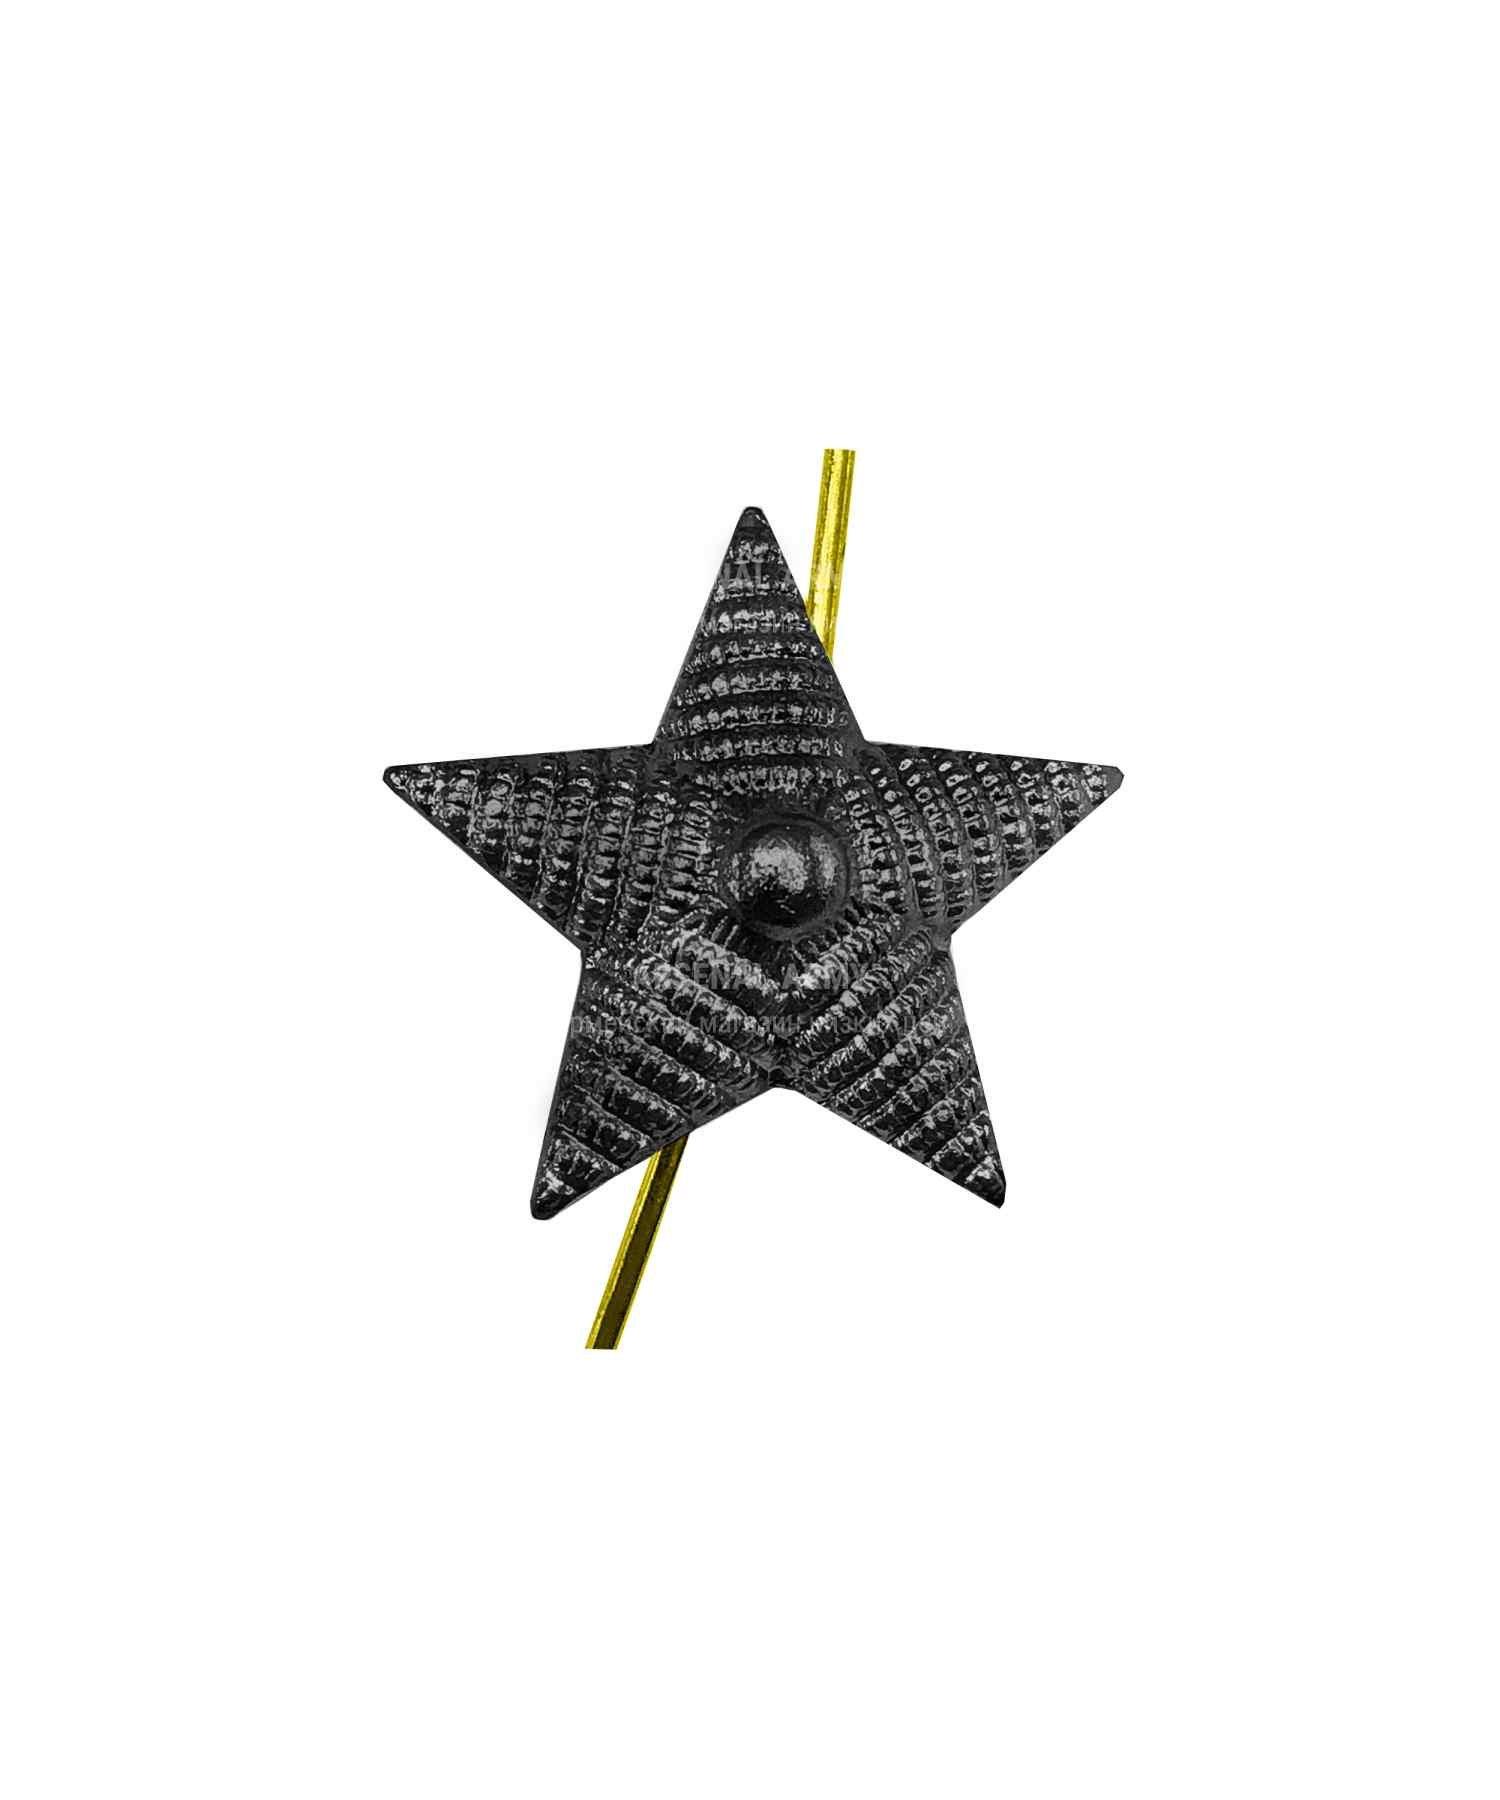 Звезда на погоны рифленая ФСИН черная 20 мм